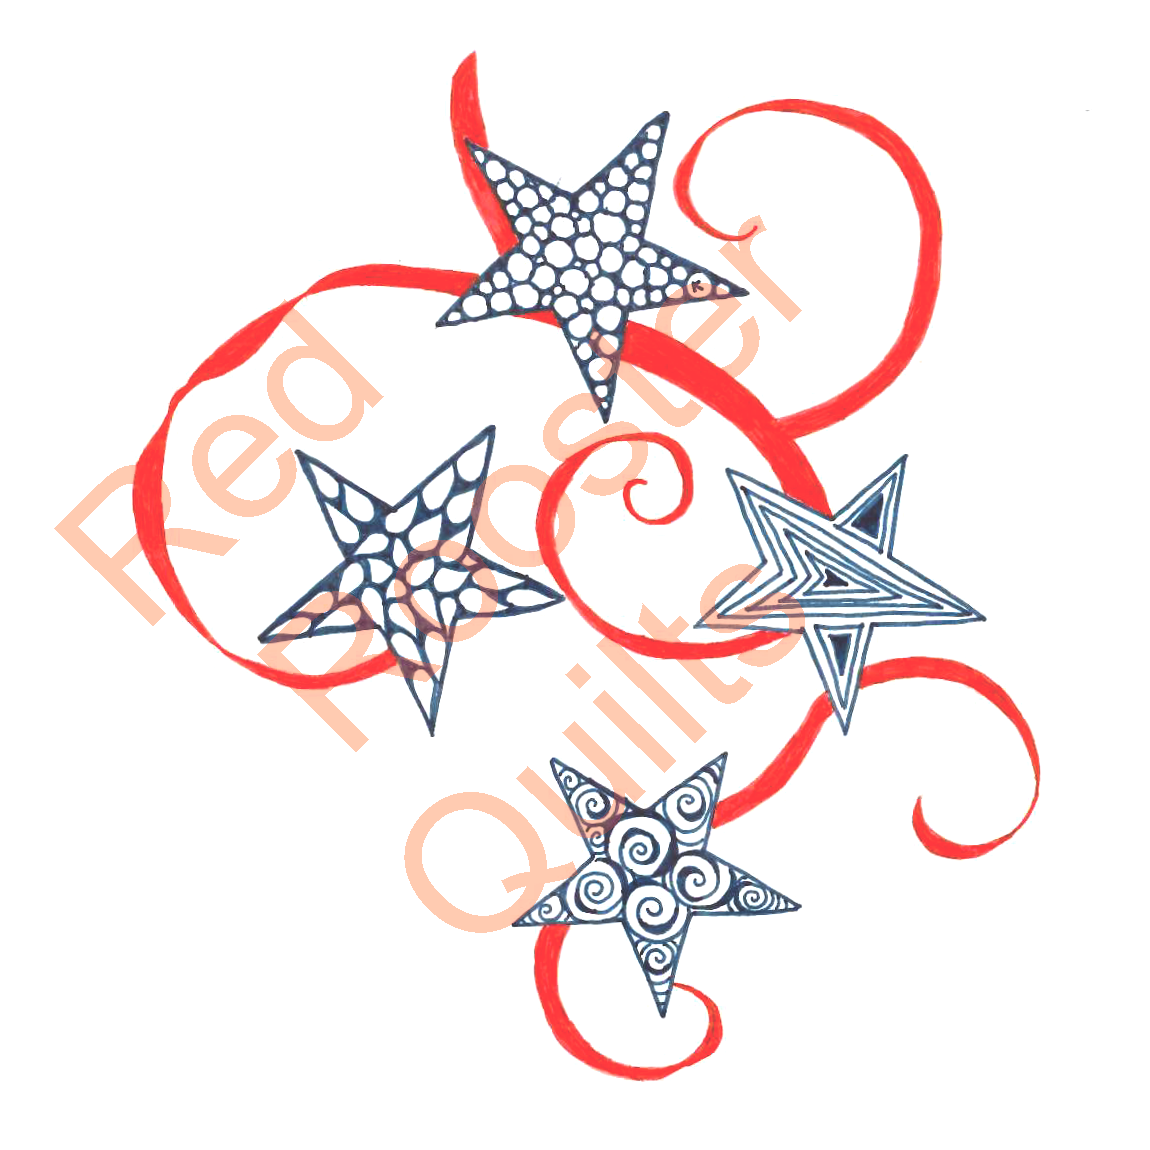 Zentangle Inspired Stars and Ribbon Swatch - RRQ Original